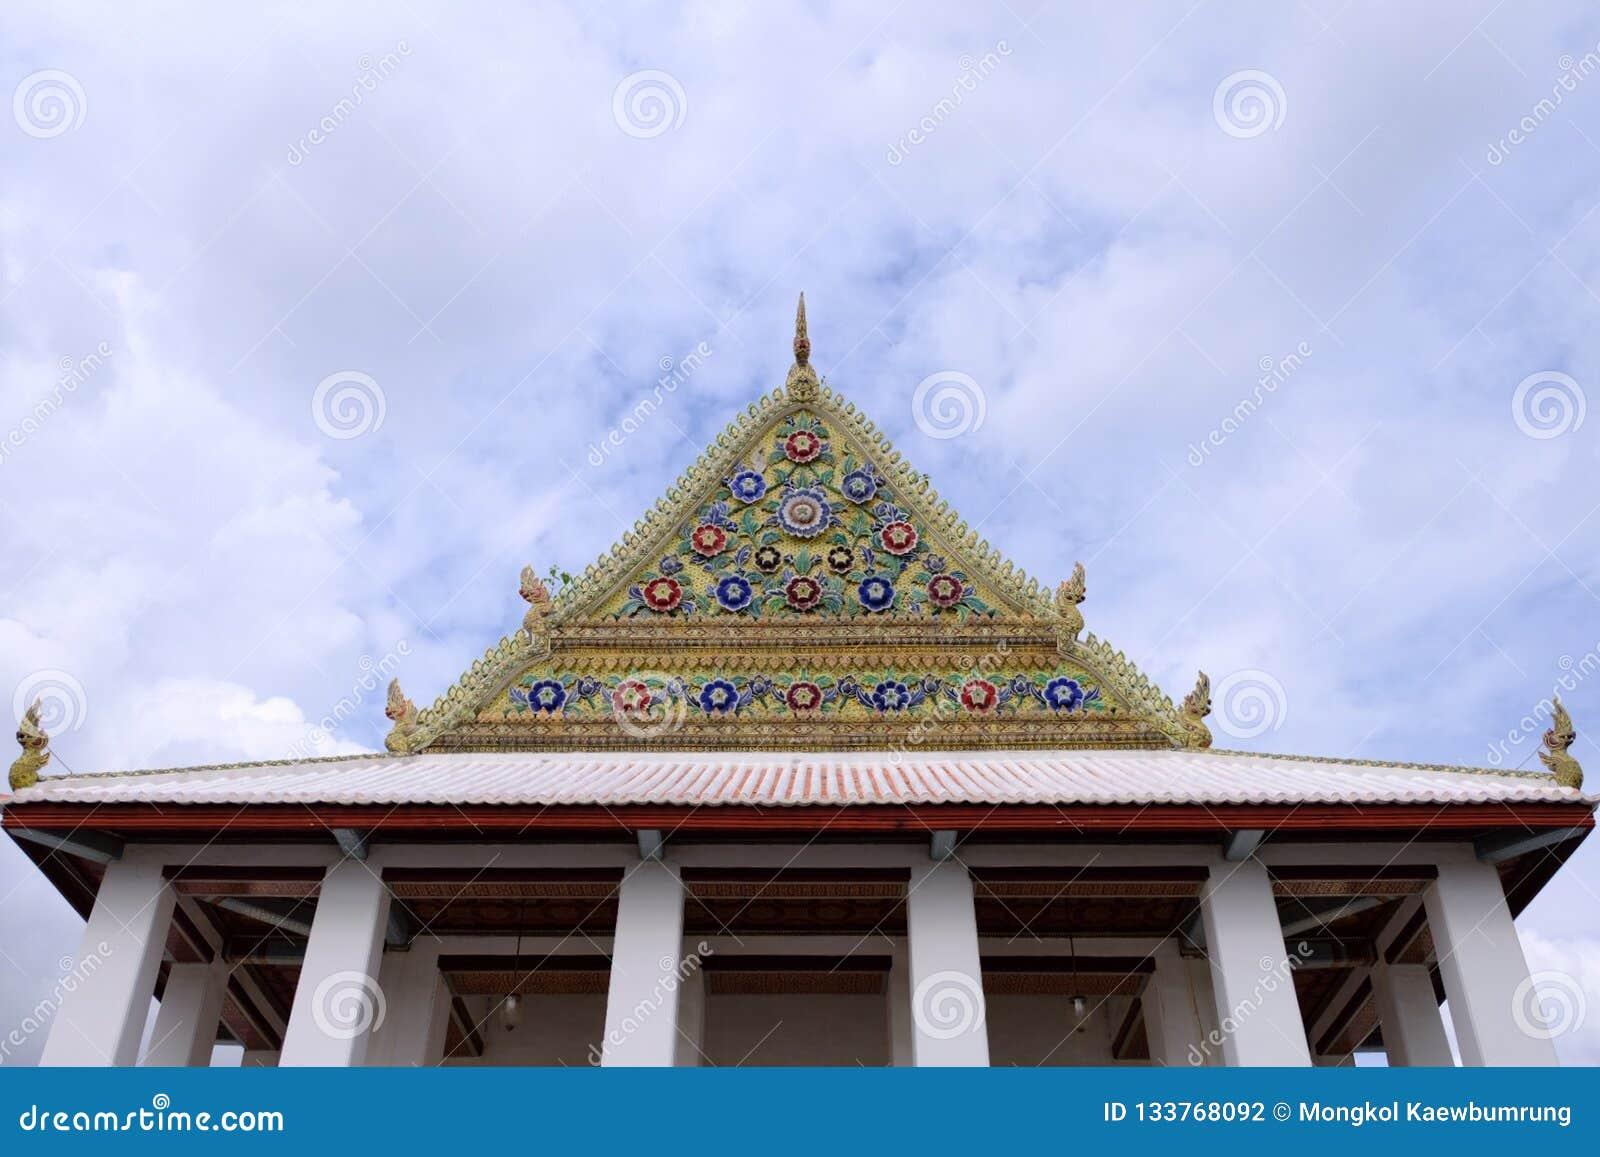 Тайский королевский щипец святилища от Wat Chaloem Phra Kiat Worawihan